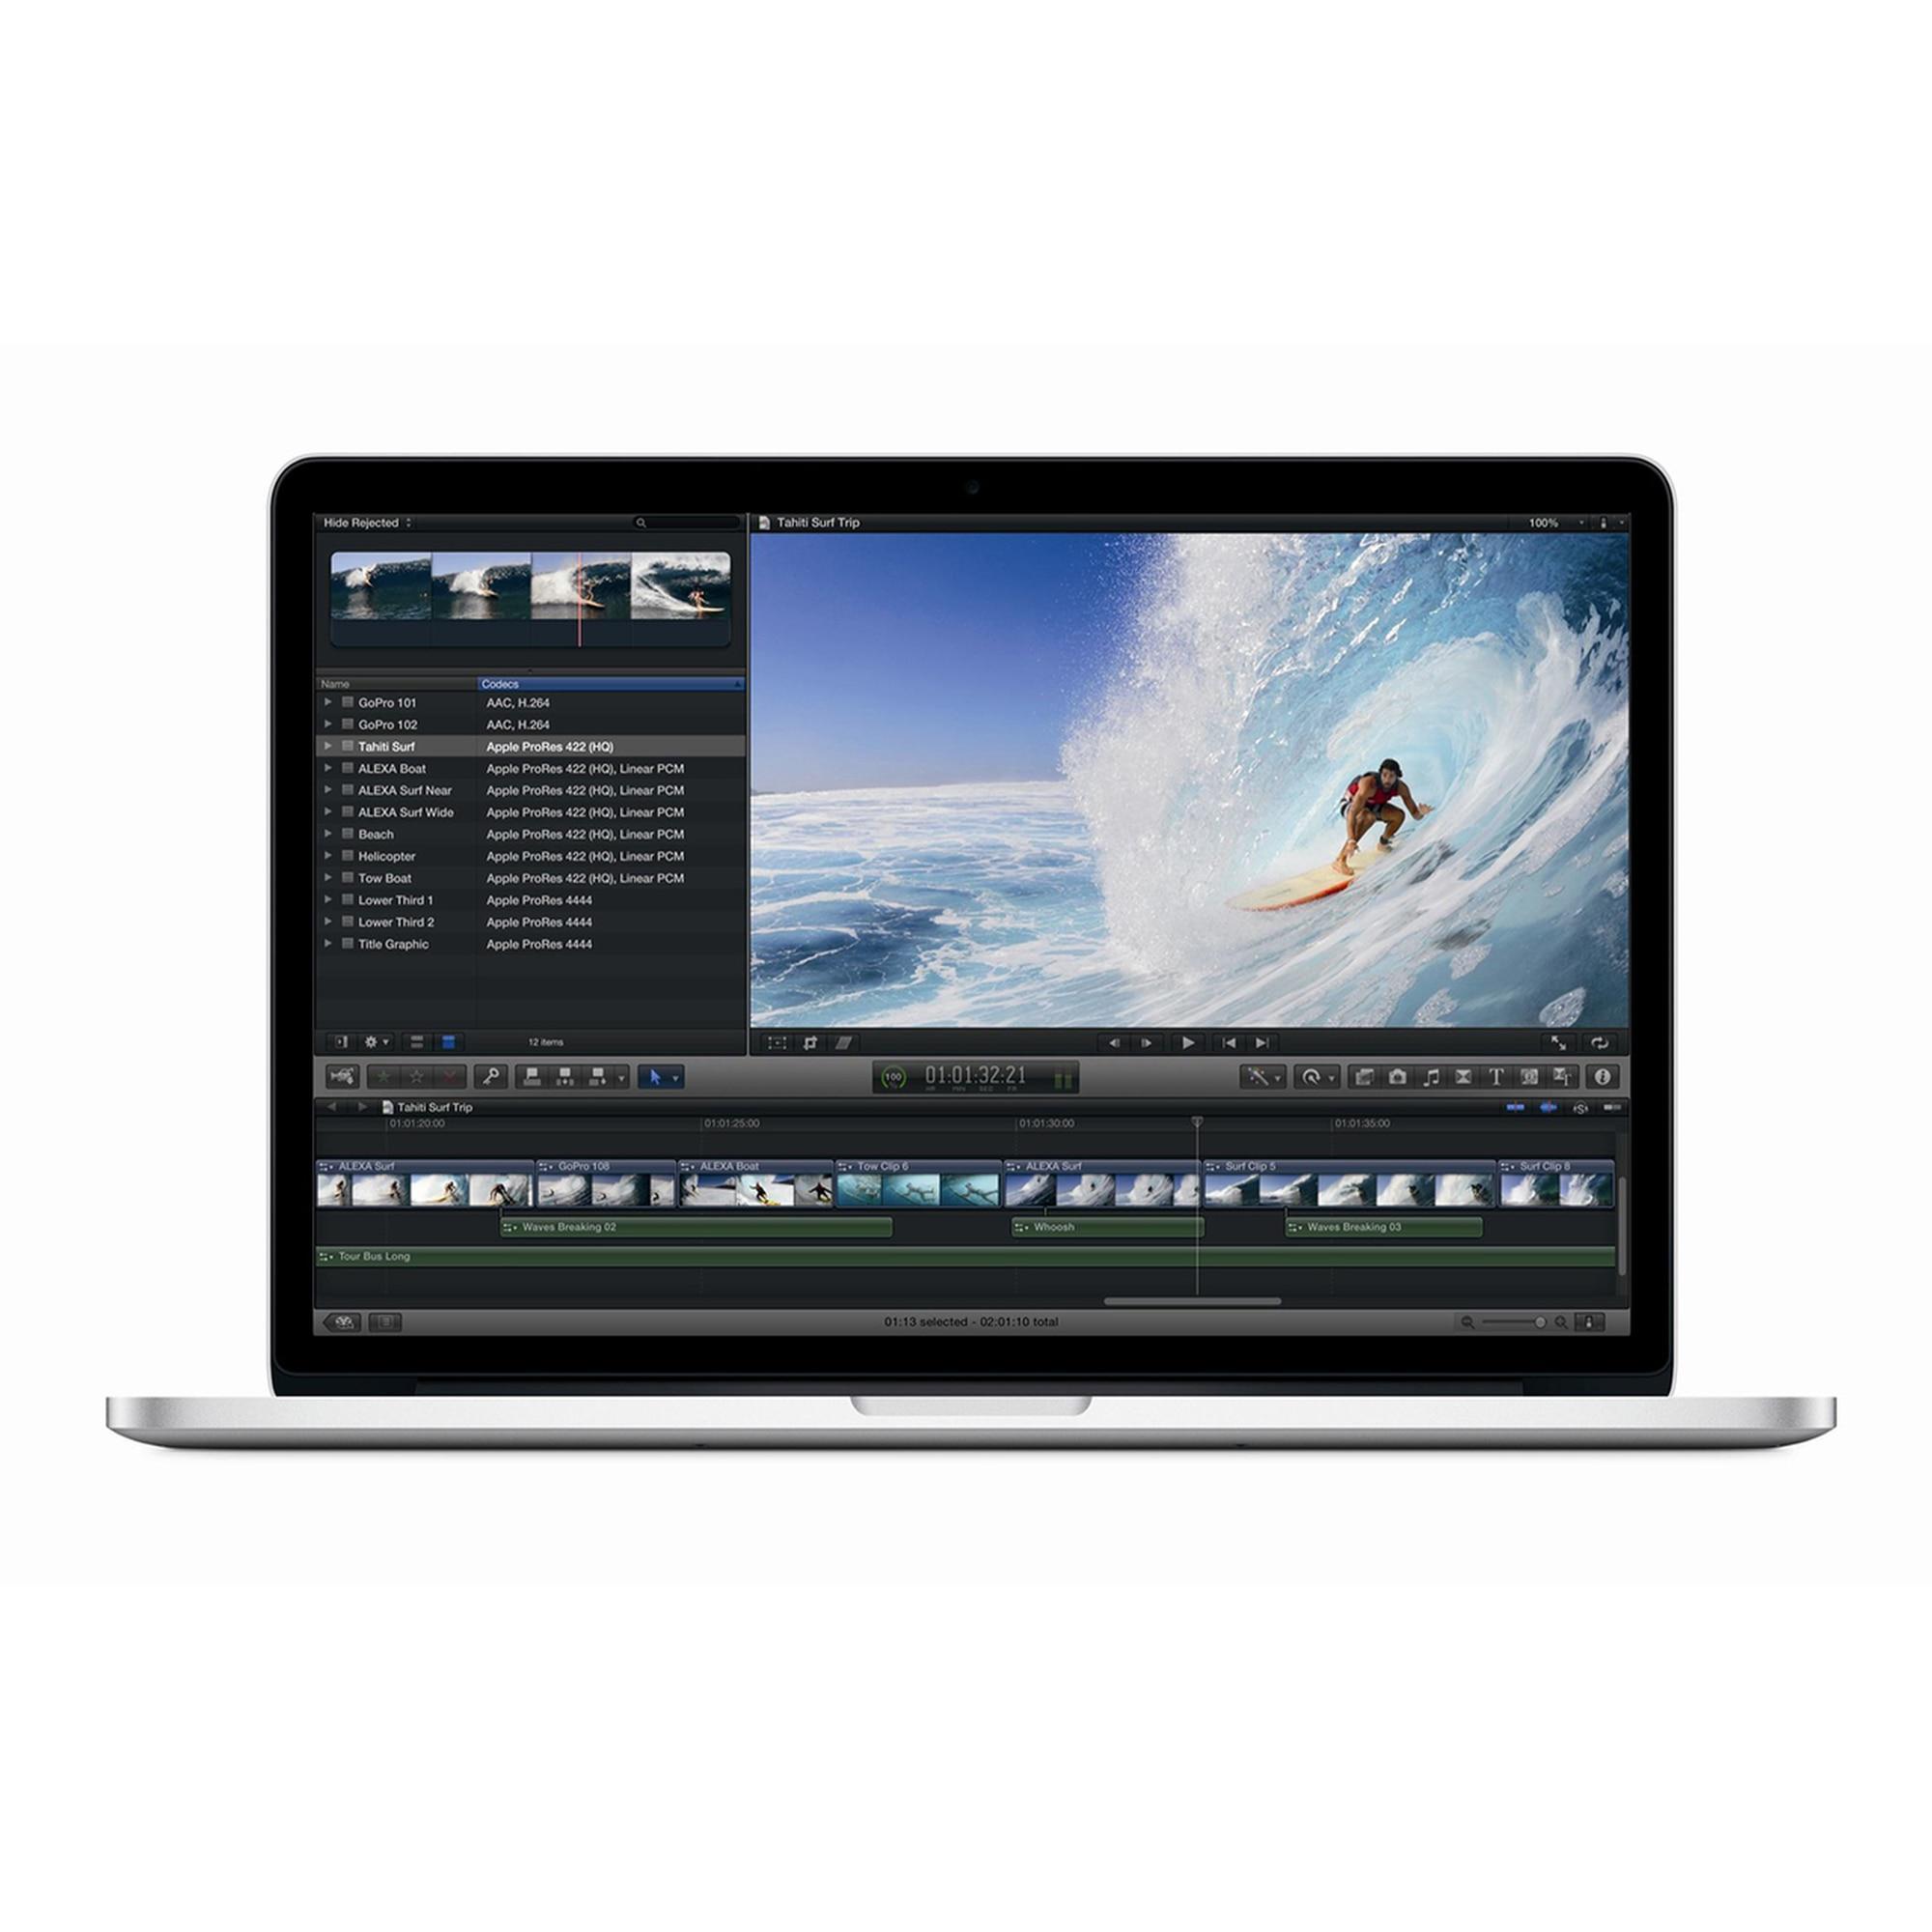 MacBook Pro Retina 15,4-tum (2014) - Core i7 - 16GB - SSD 256 GB AZERTY - Fransk